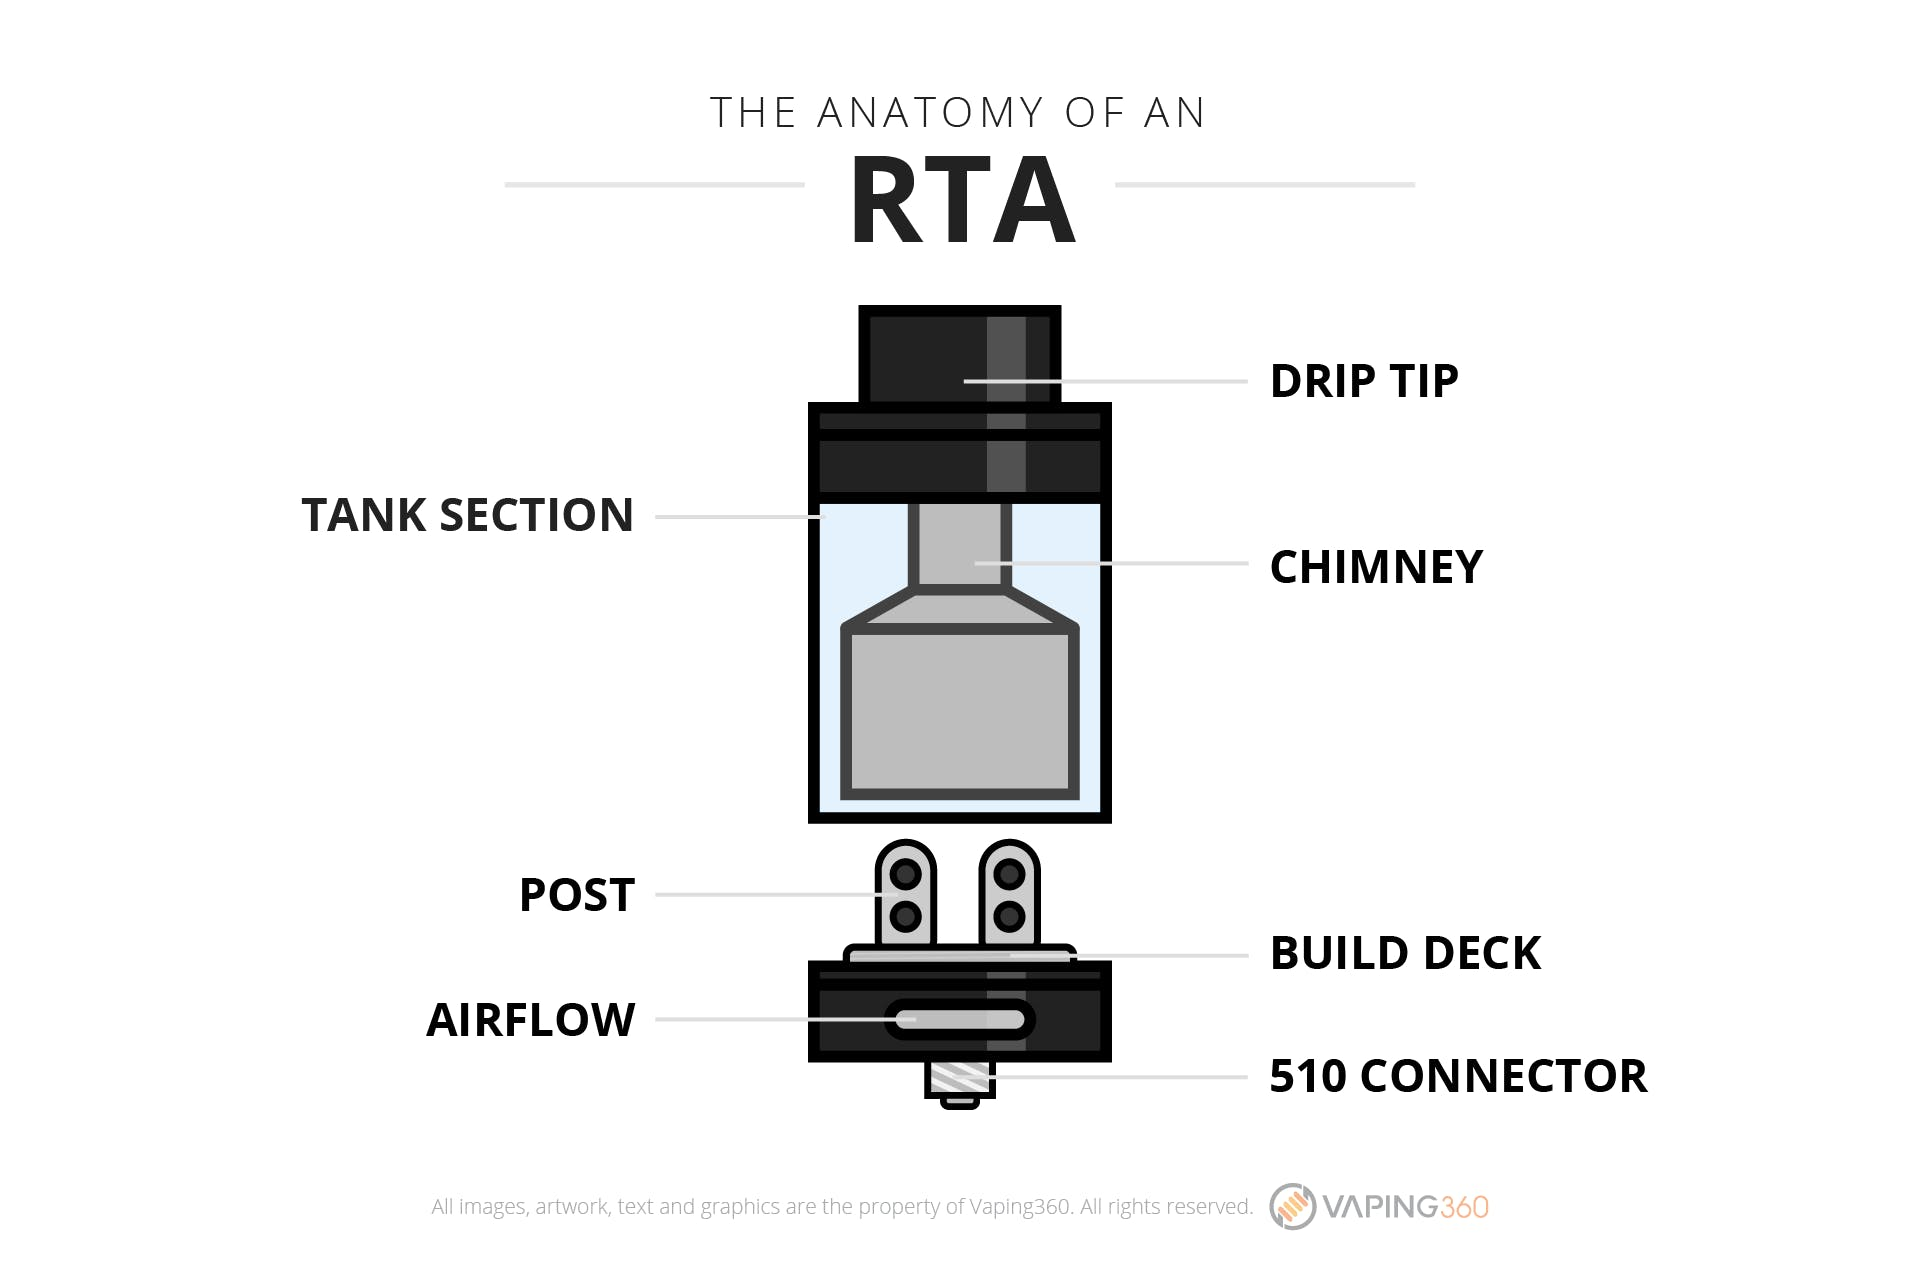 The anatomy of an RTA